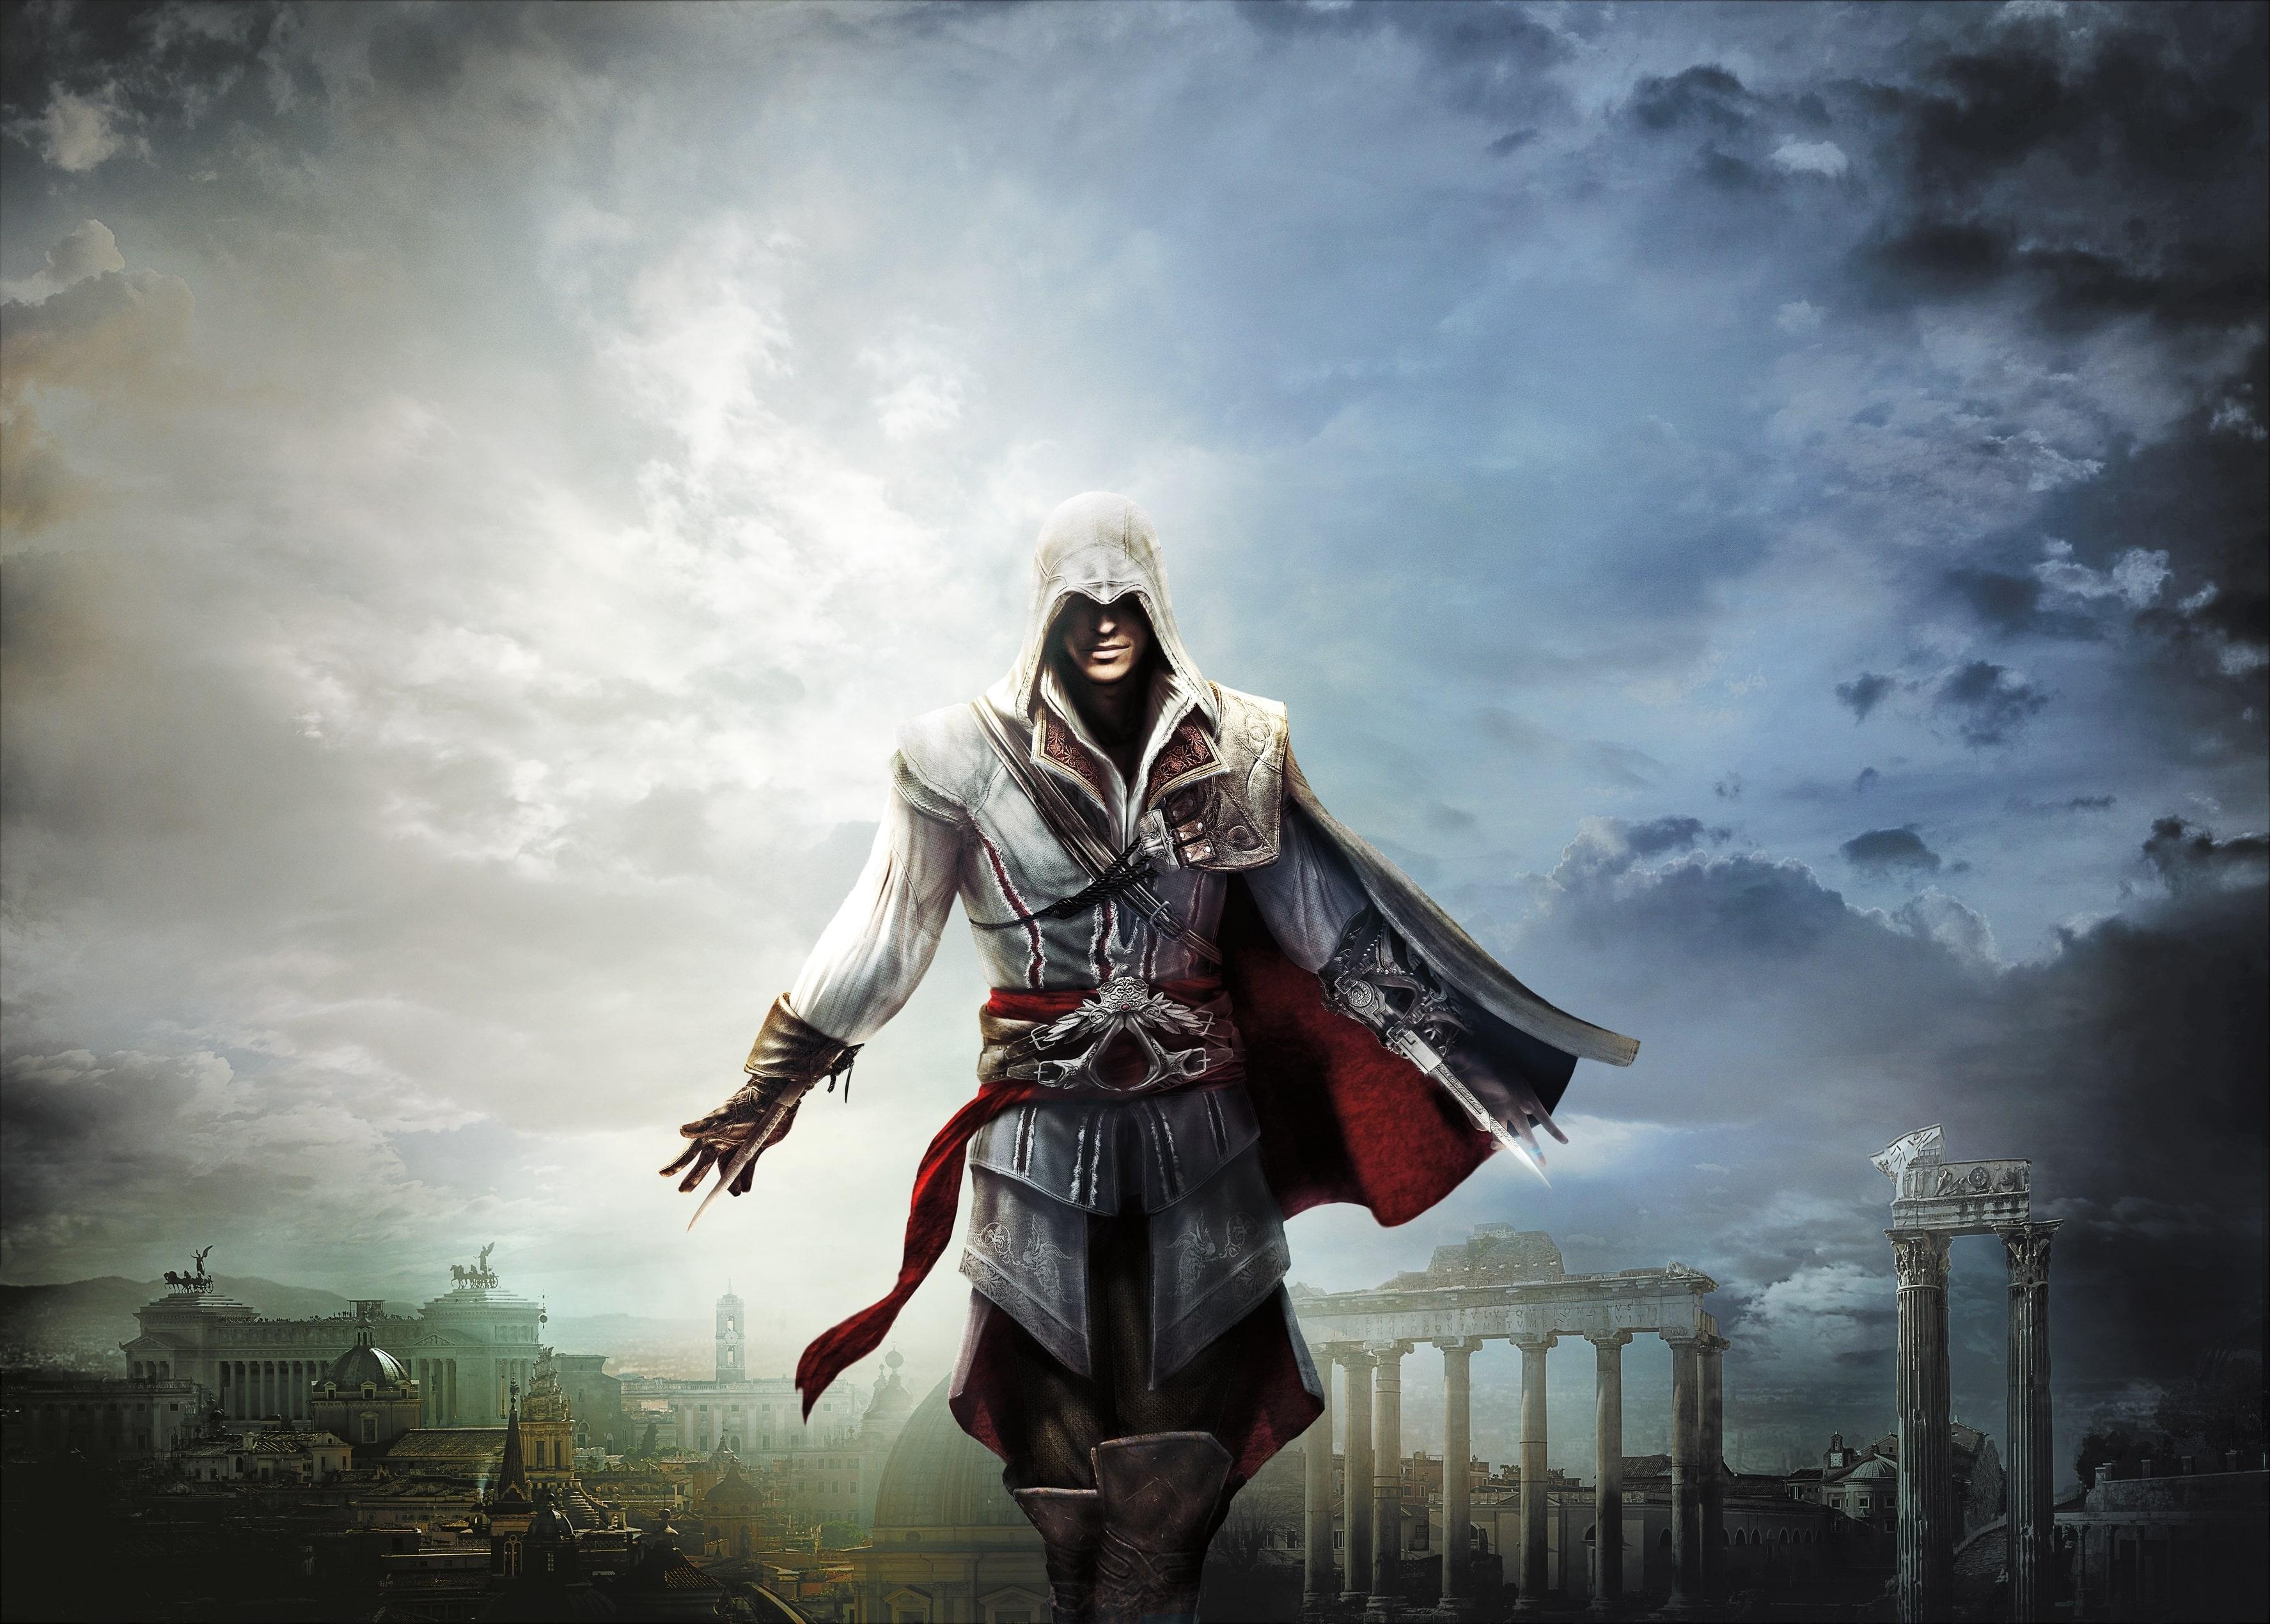 assassin's creed the ezio collection annoncée sur ps4 & xbox one